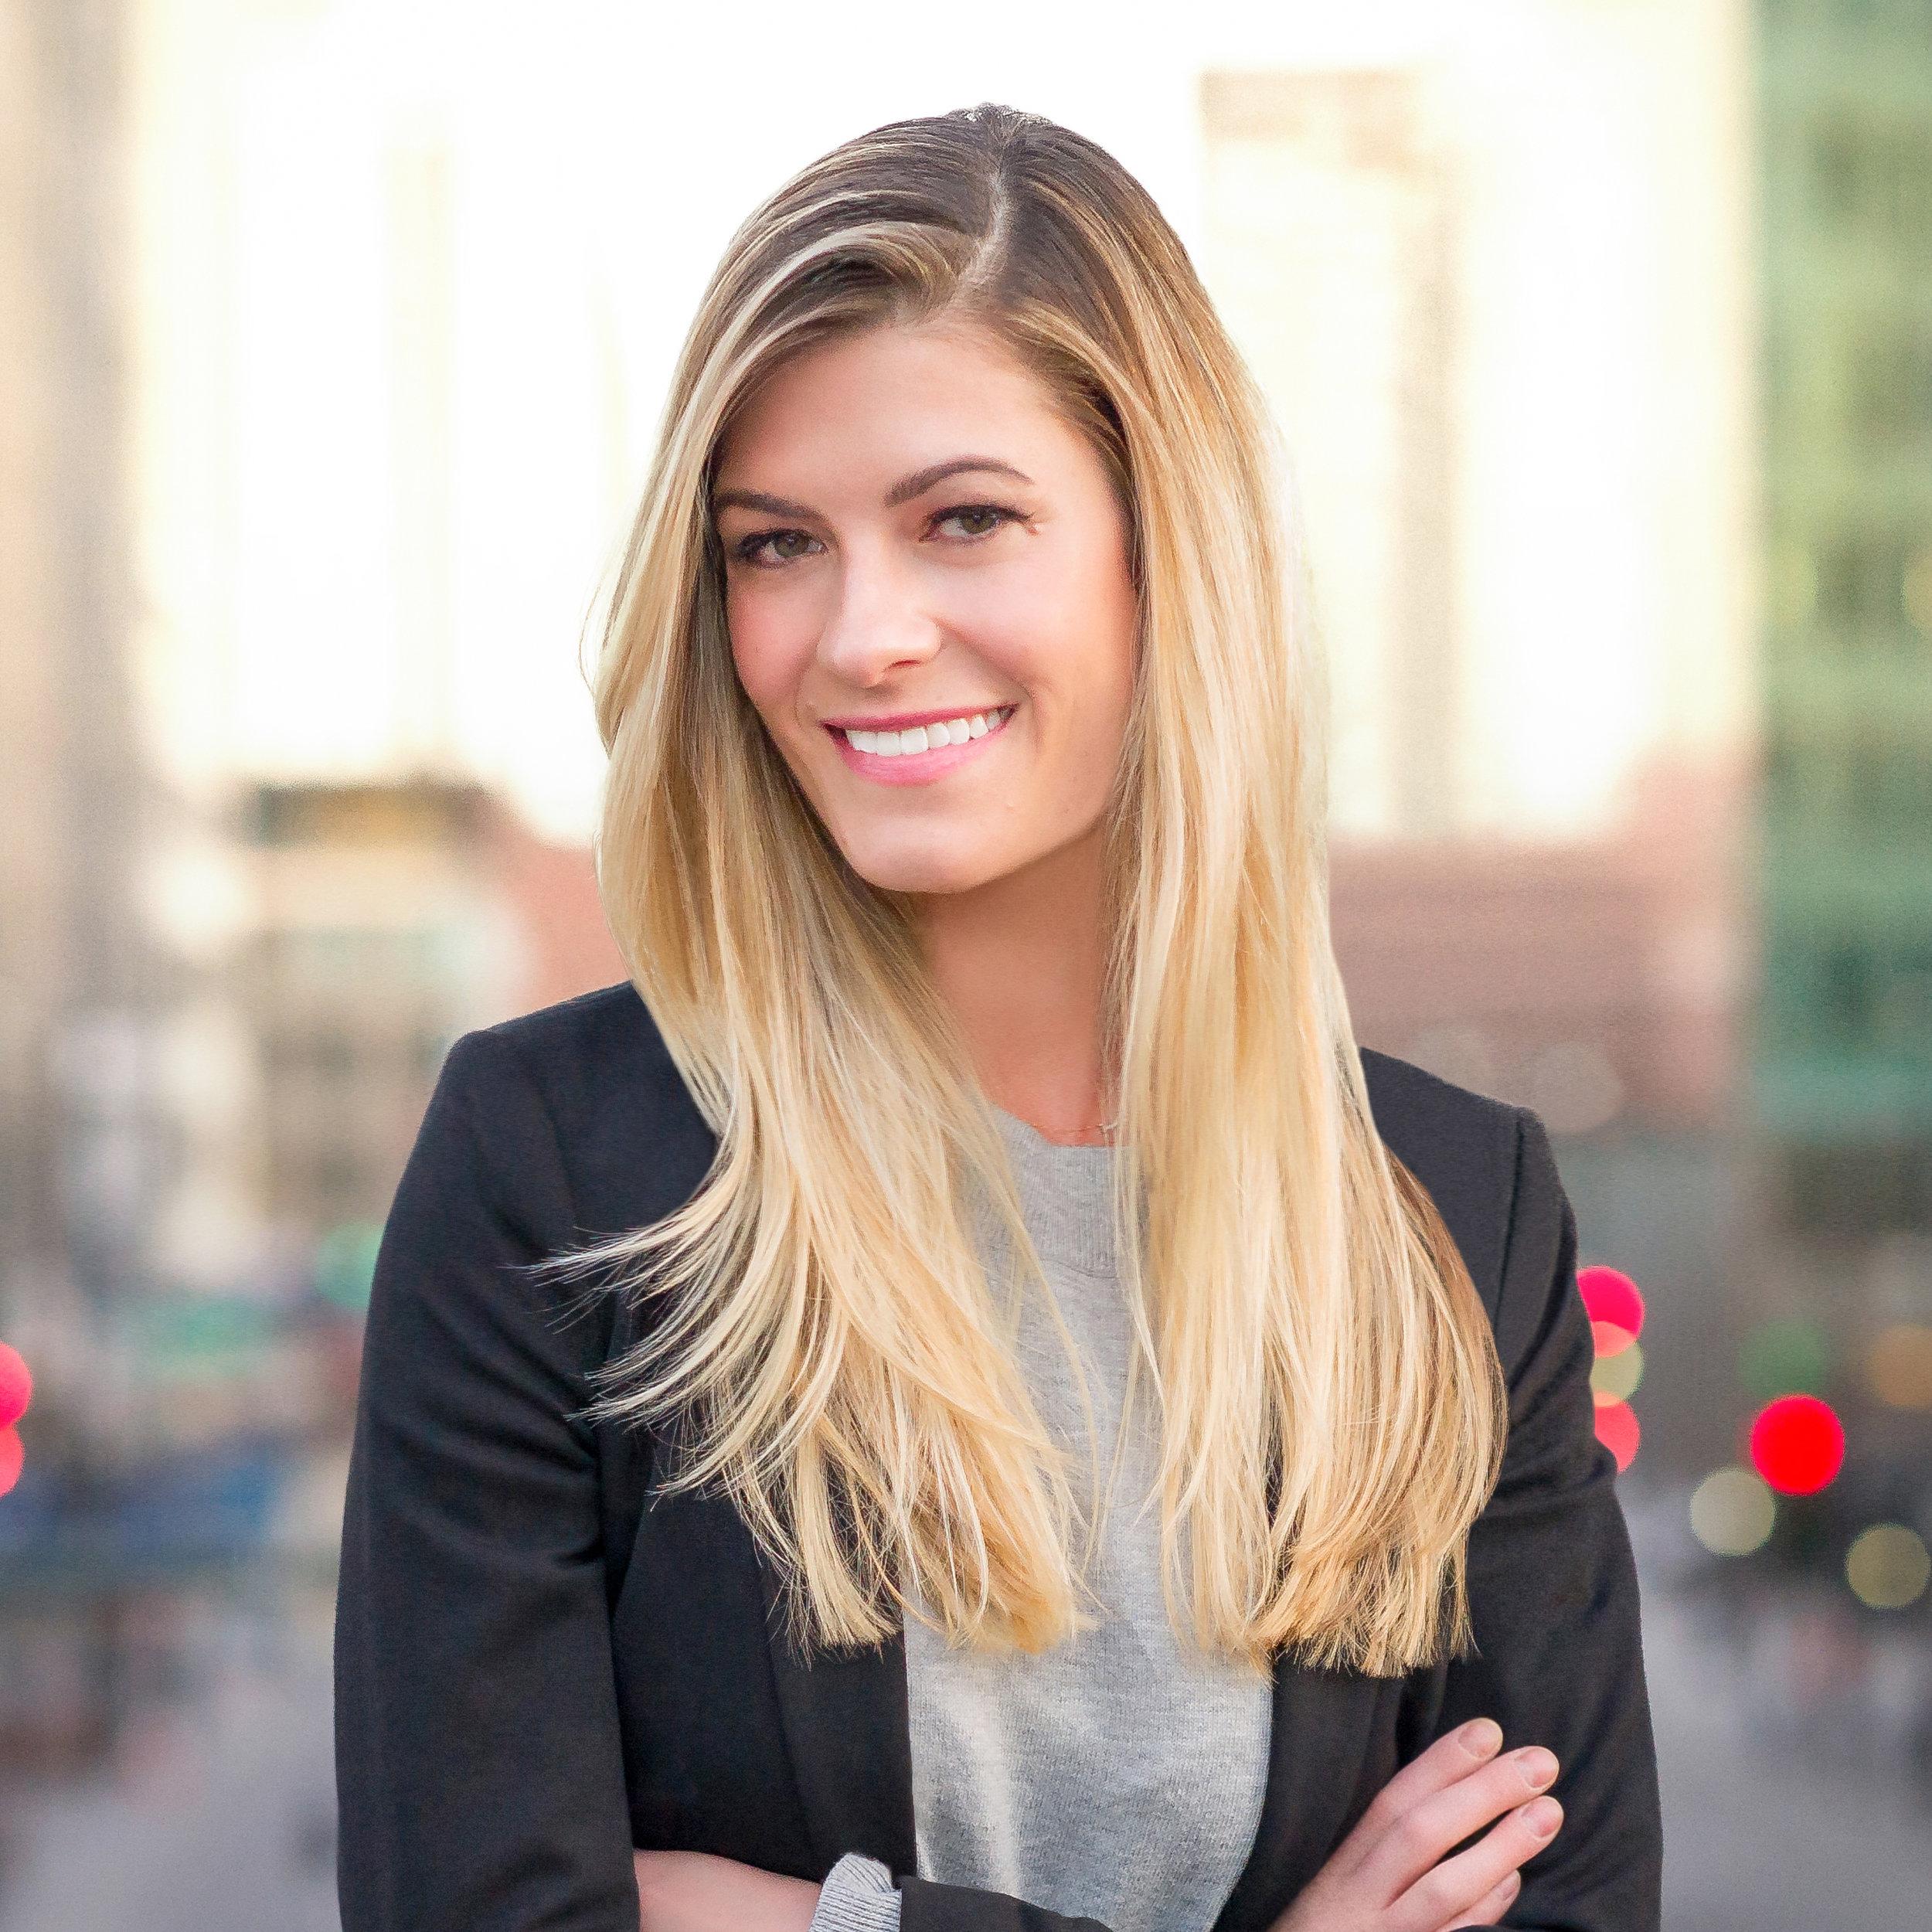 ADRIA DILLON | FOUNDER & SR. CORPORATE PARALEGAL